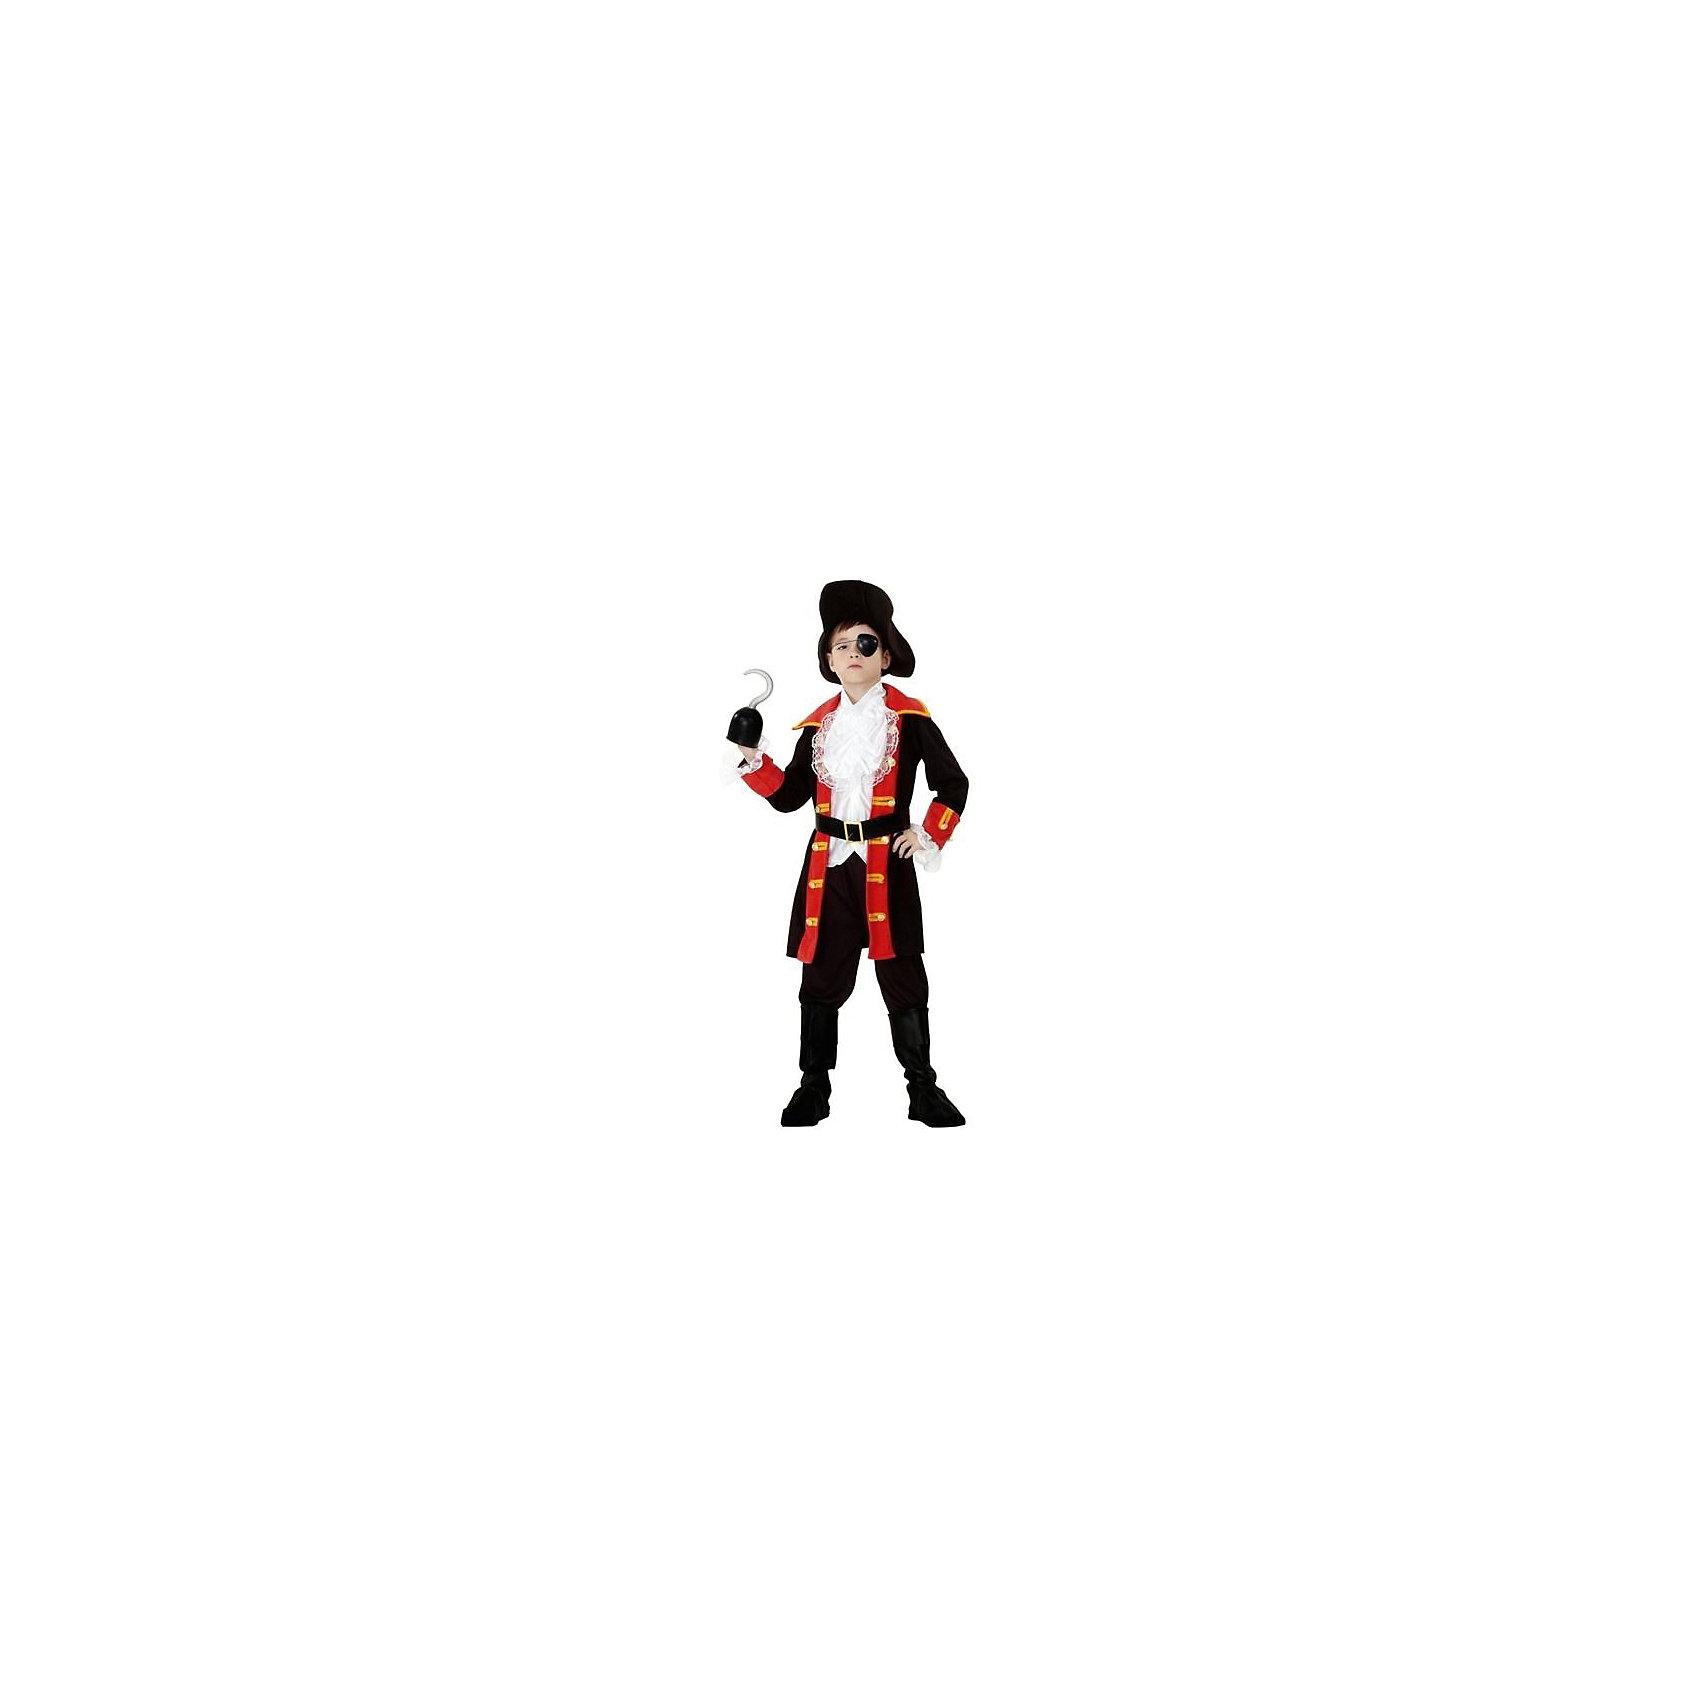 Magic Time Маскарадный костюм для мальчика Капитан Крюк, 6-8 лет феникс презент маскарадный костюм для девочки лесная фея 6 8 лет